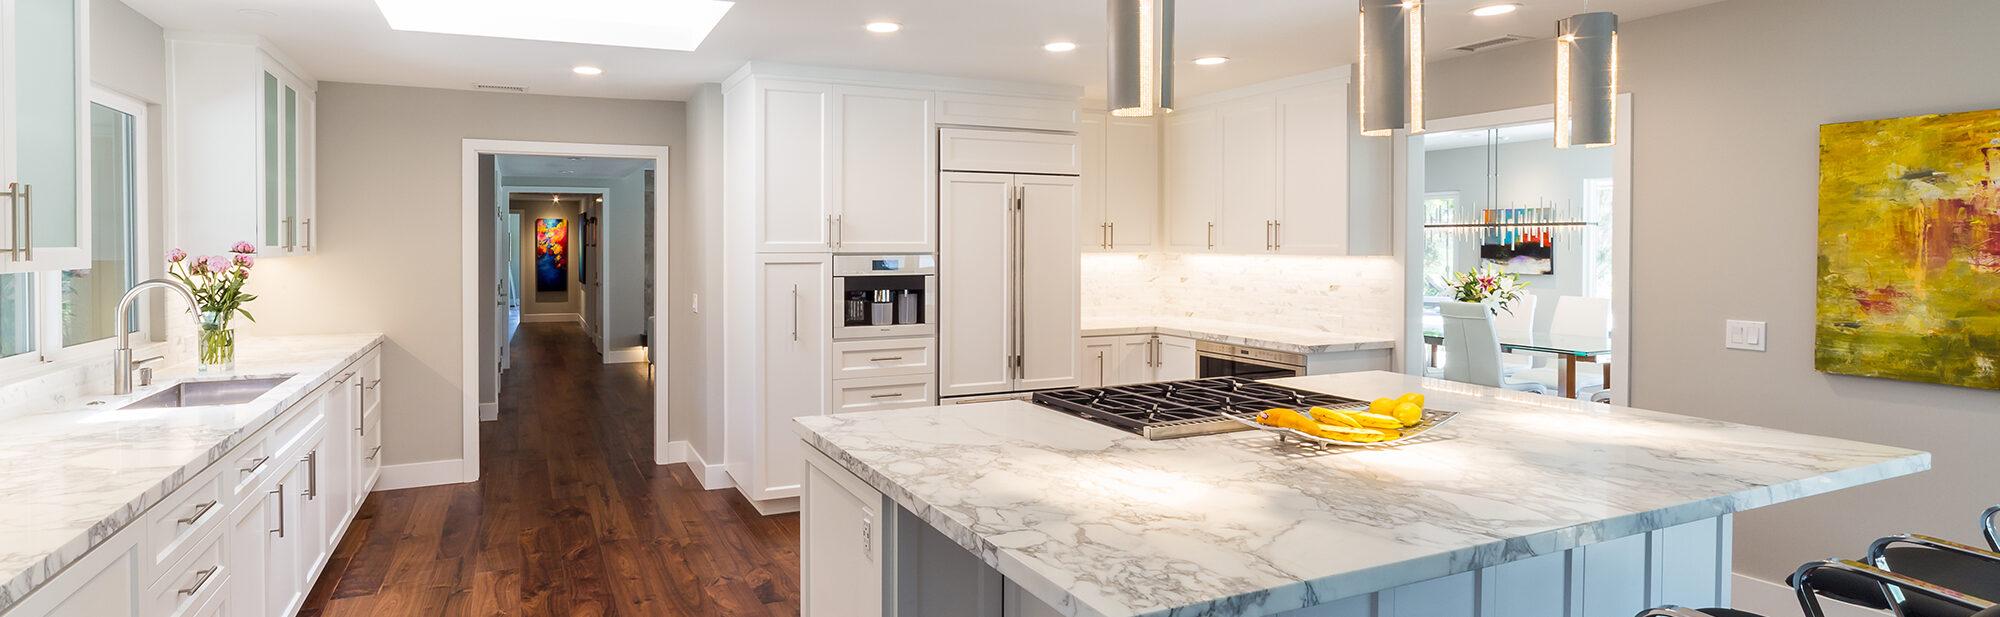 kitchen remodeling company in portland oregon